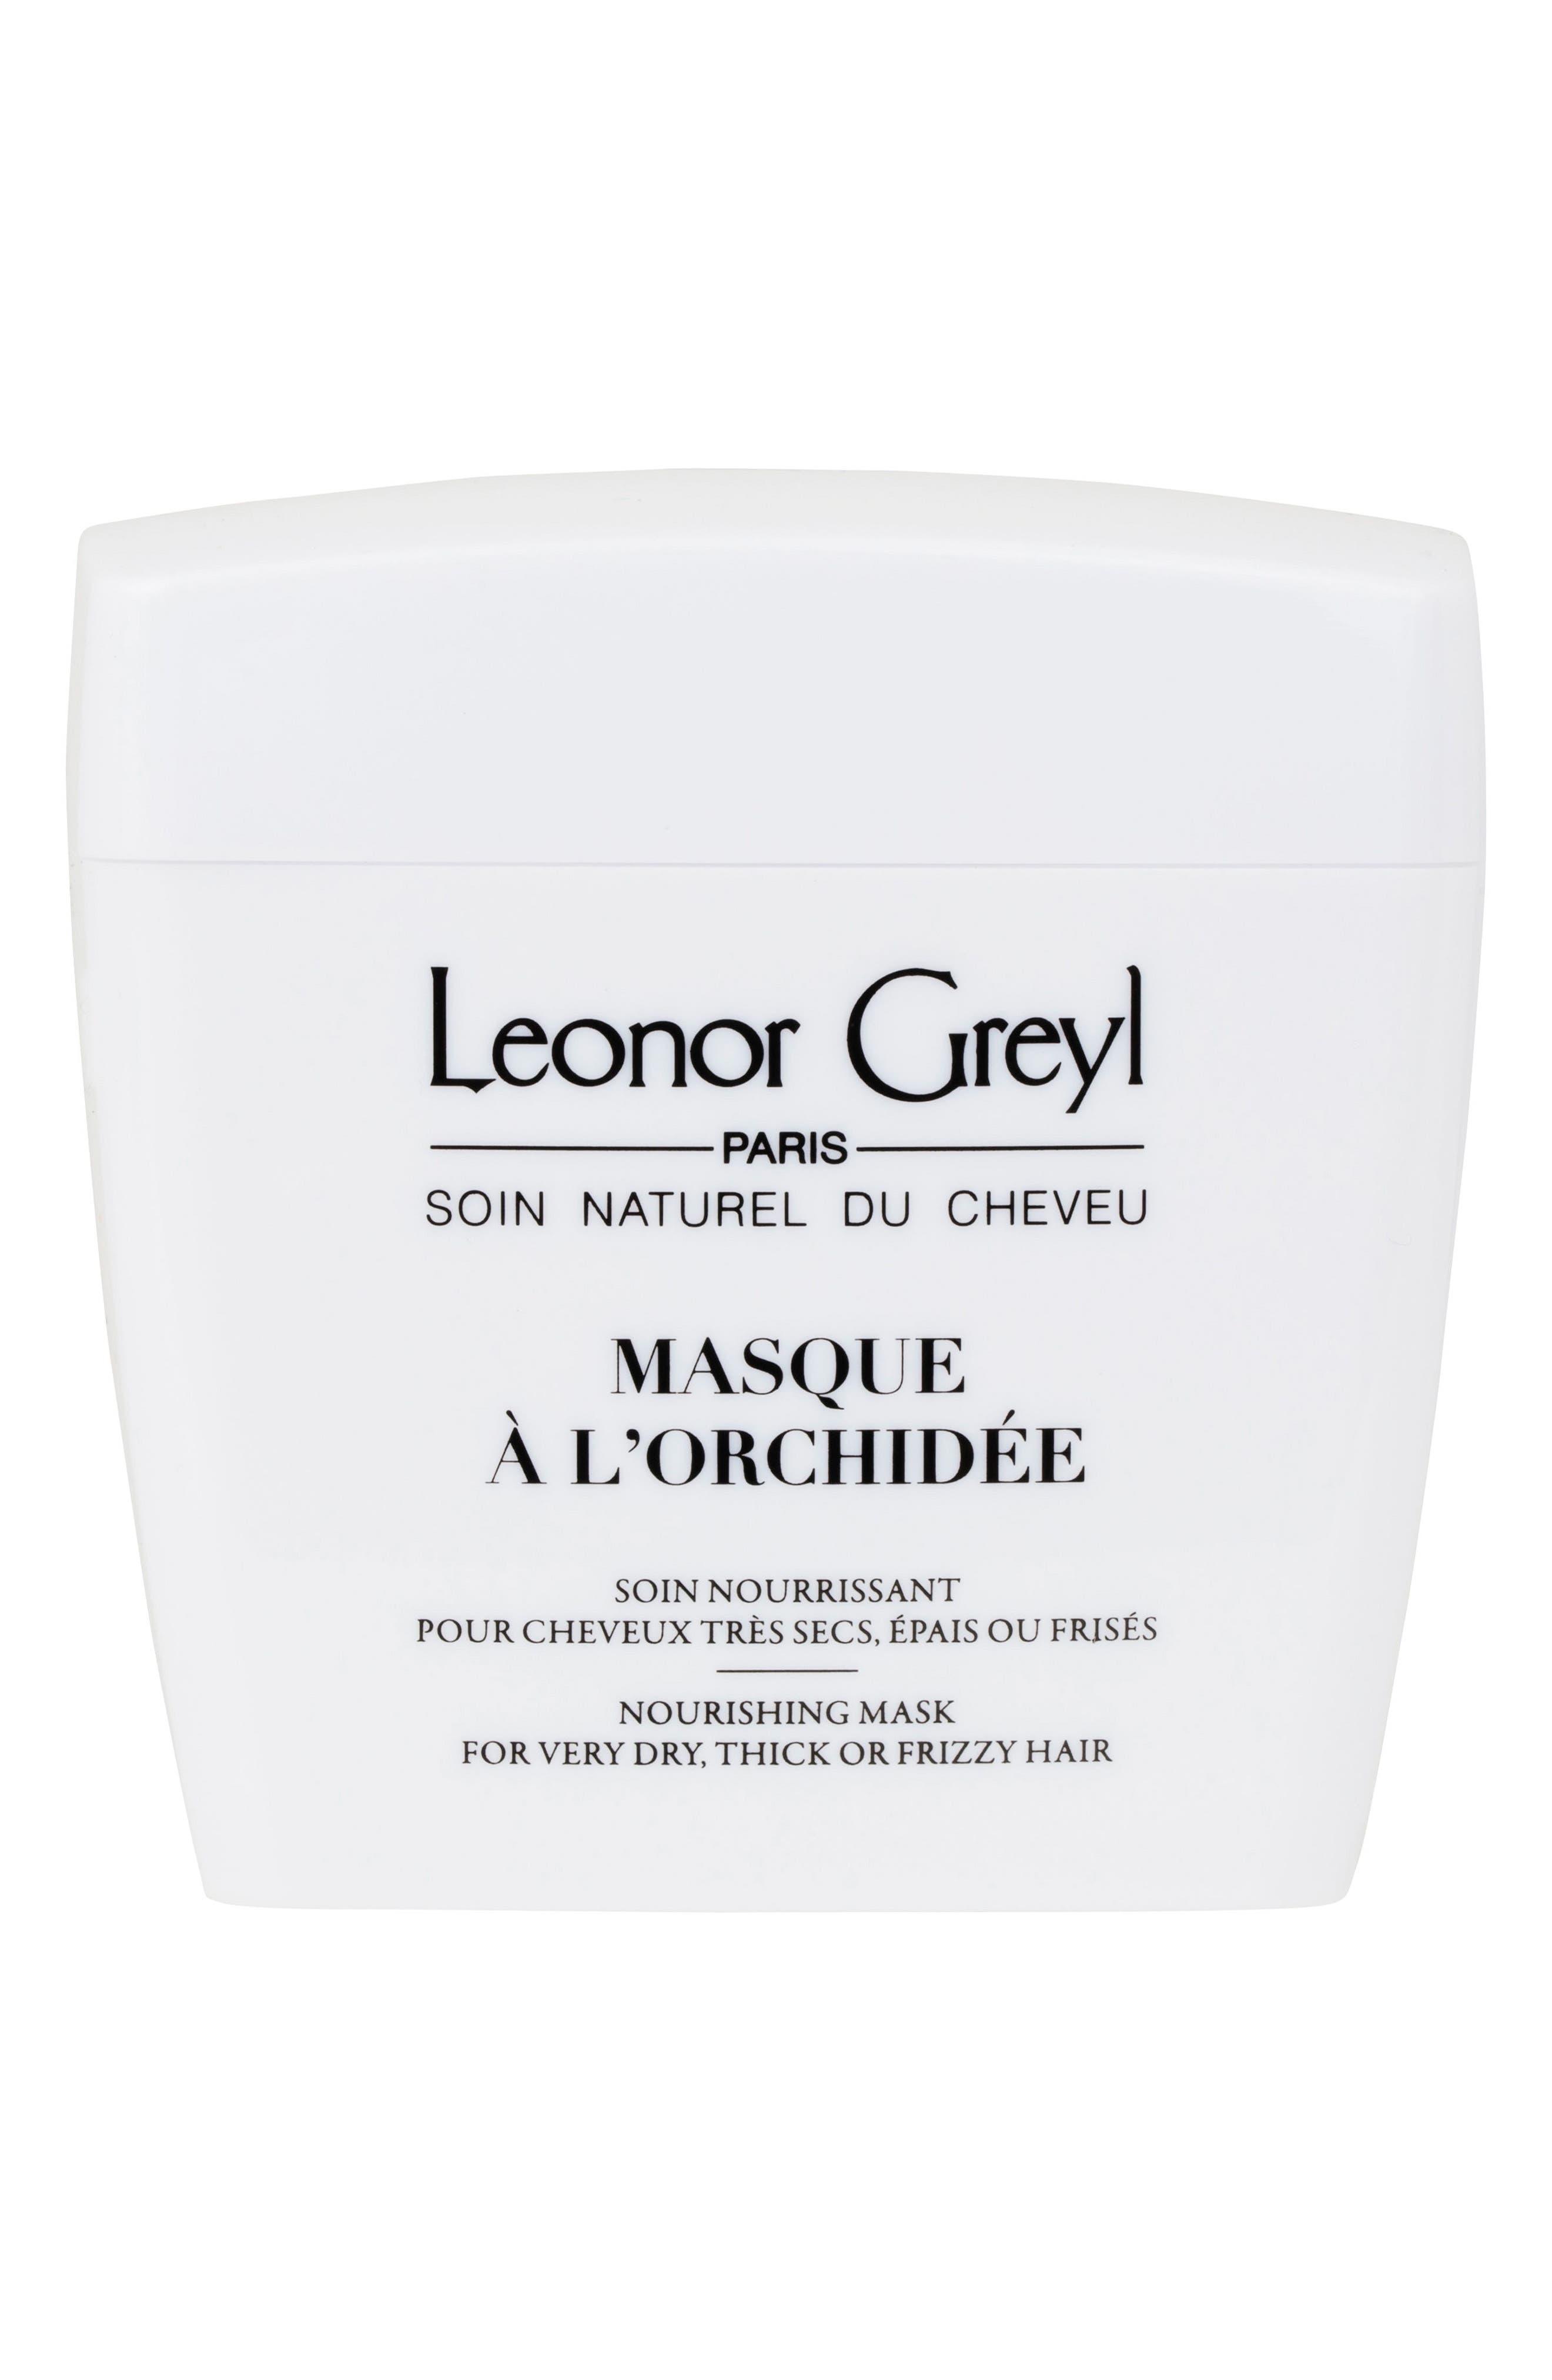 Alternate Image 1 Selected - Leonor Greyl PARIS 'Masque à l'Orchidée' Softening Hair Mask